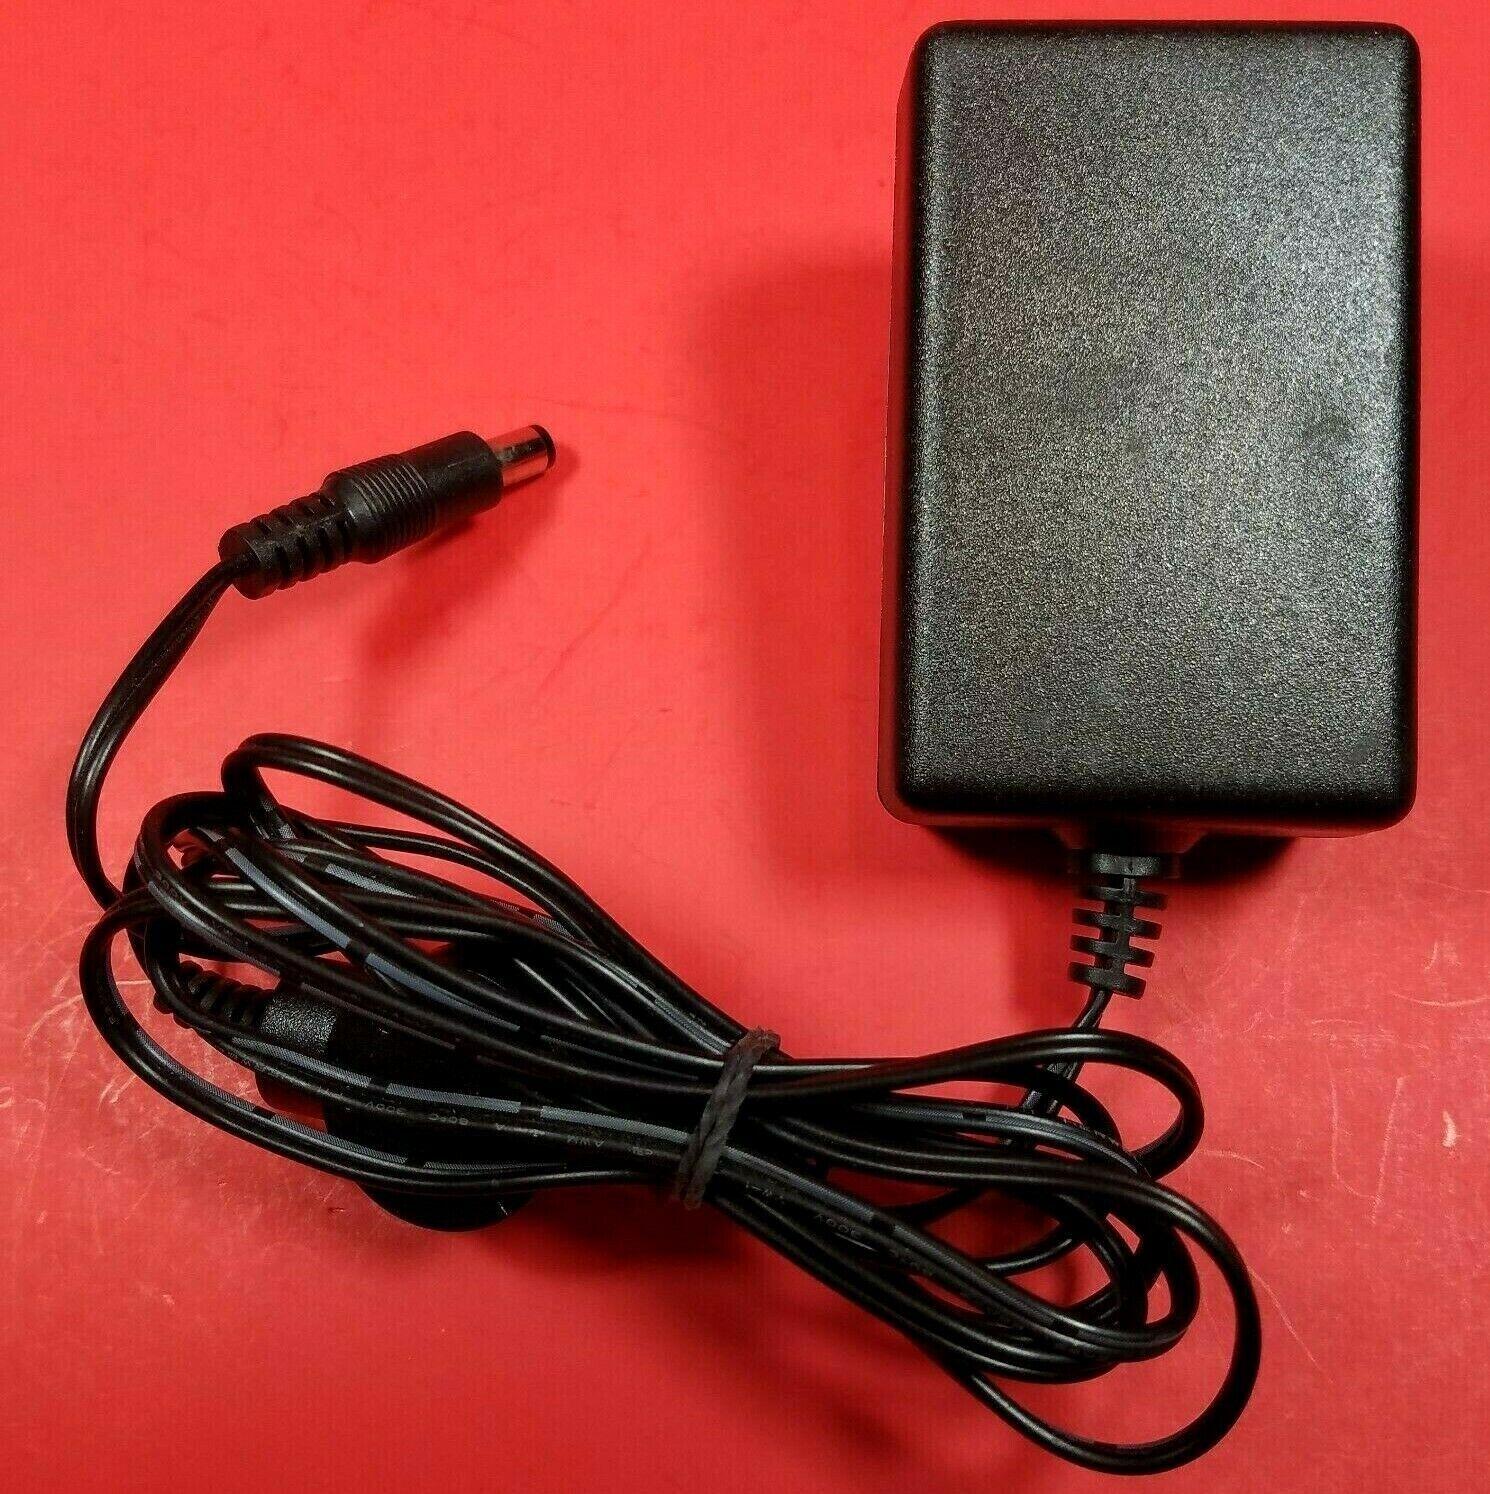 Genuine KINGWALL AS150-120-DB Switching Power Supply 12V 1.25A OEM AC/DC Adapter